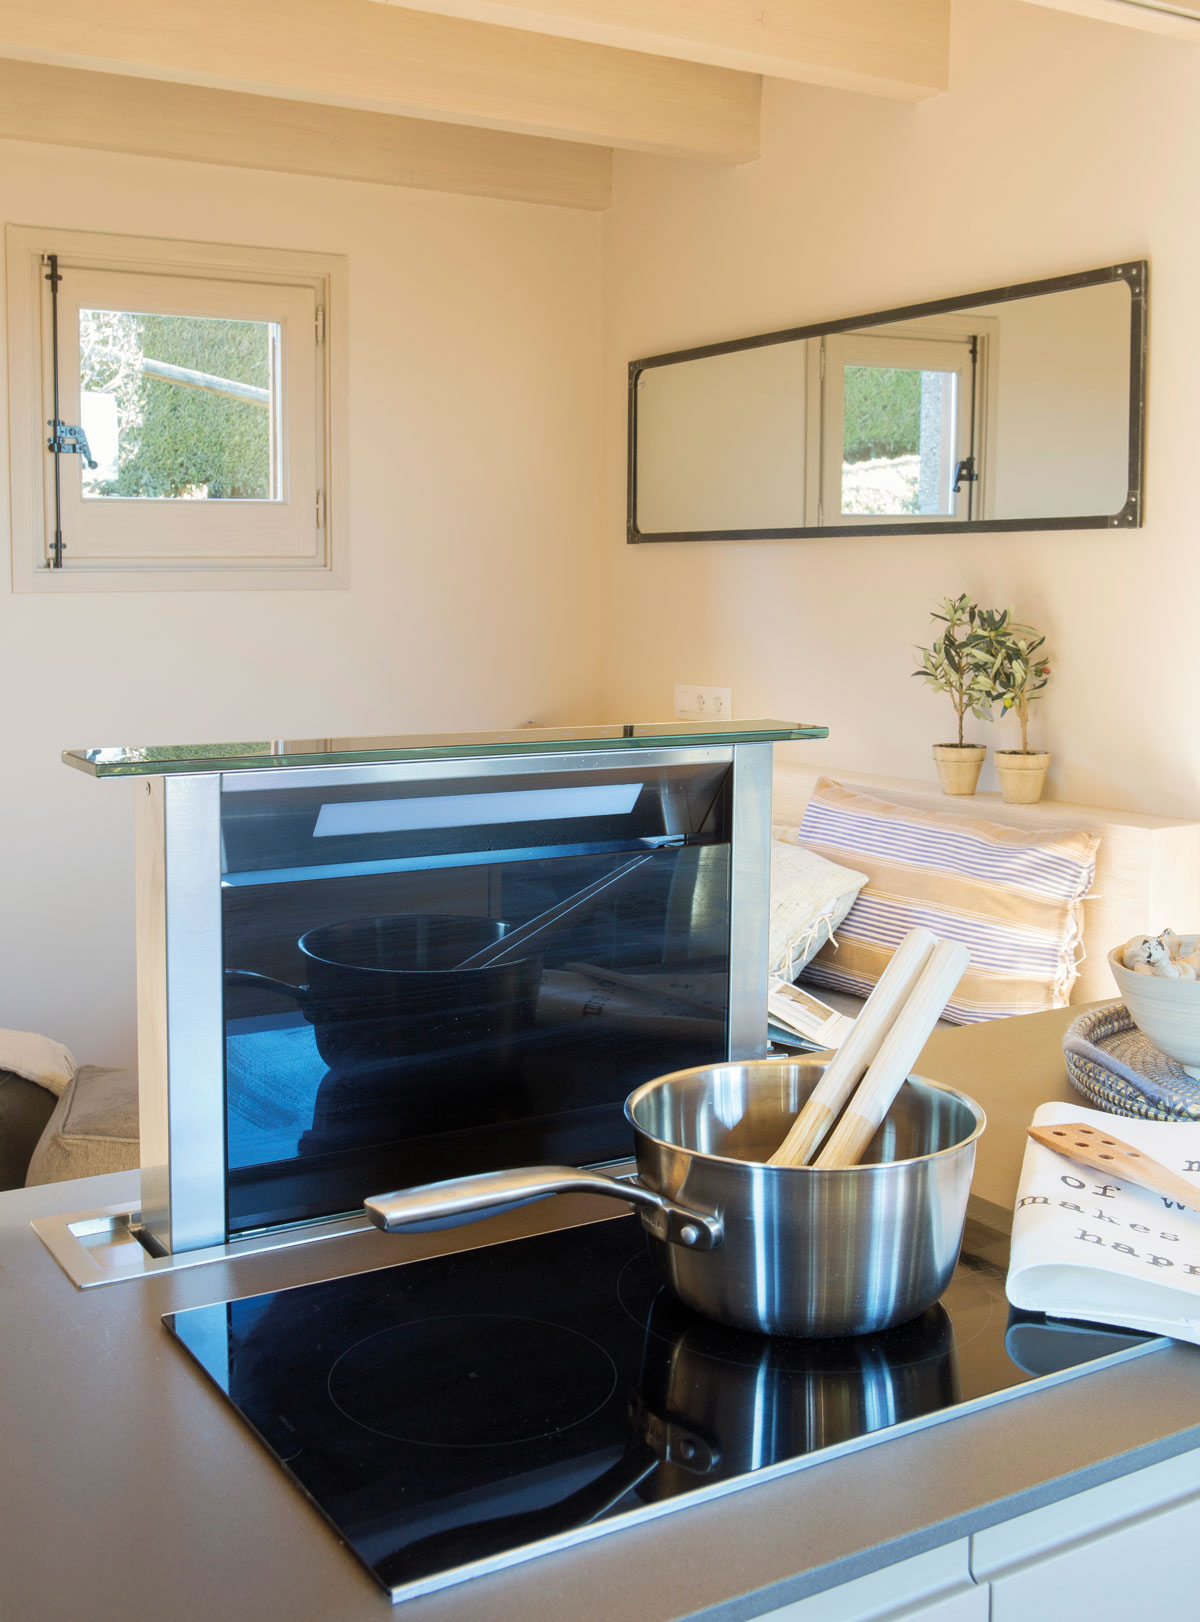 2147 fotos de cocinas for Cocina vitroceramica